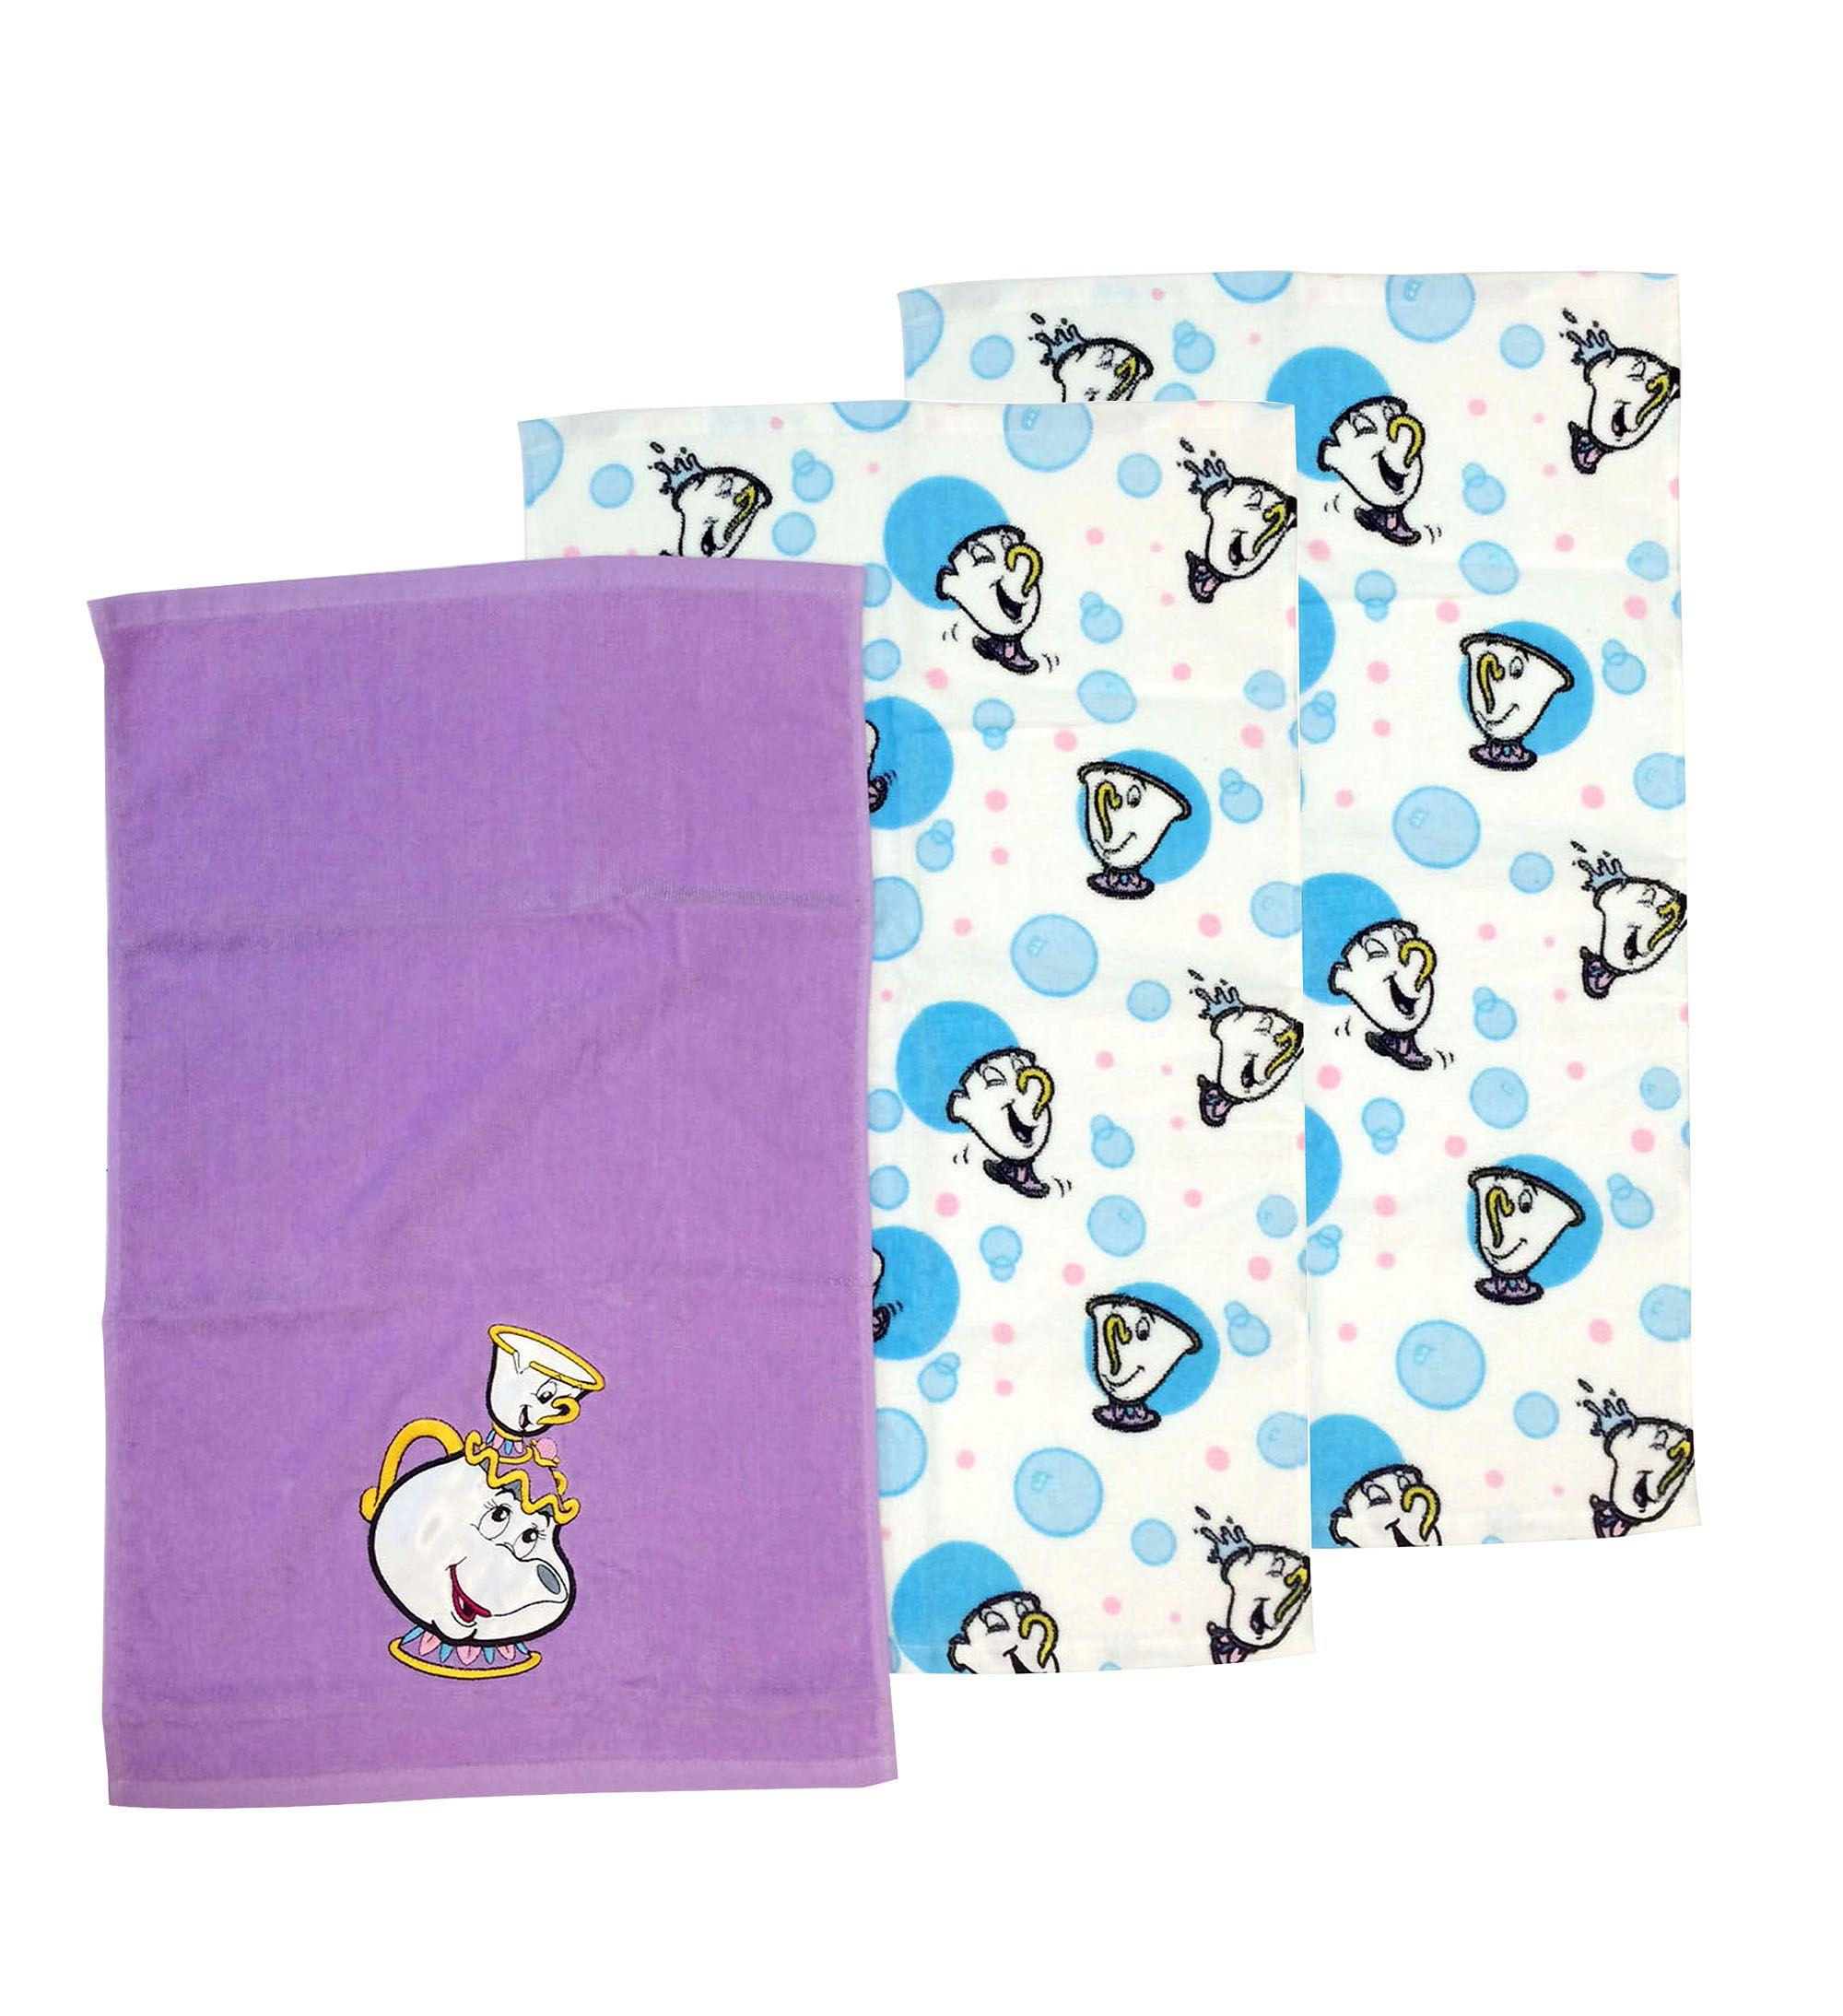 Beauty and the Beast tea towels! #kitchen #necessities #disney ...